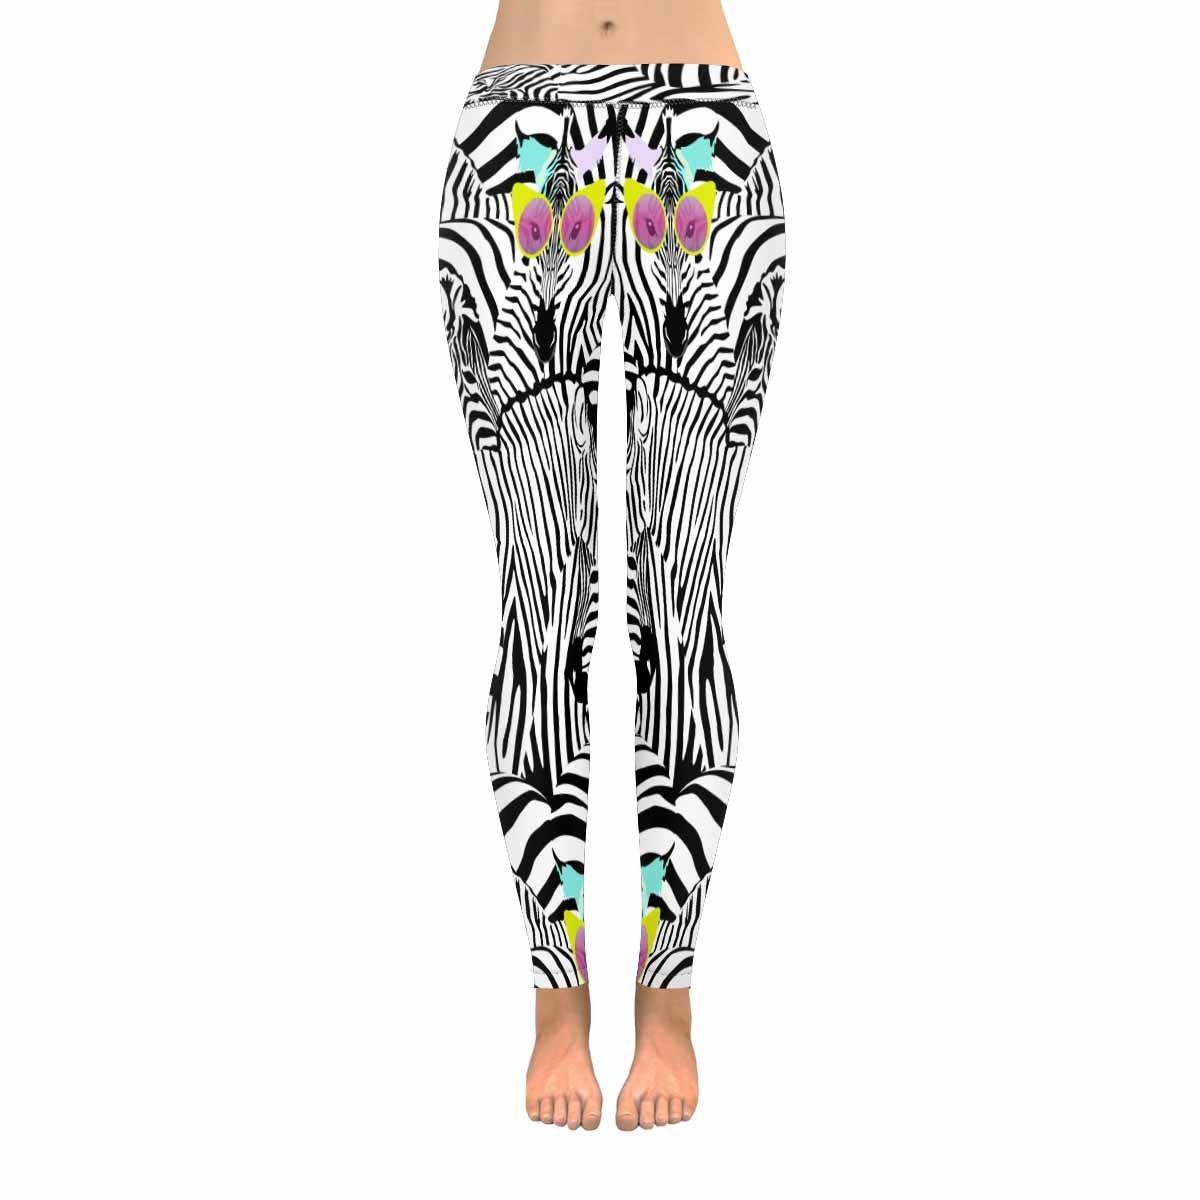 InterestPrint Modern Zebra in Sunglasses Animal Stretchy Capri Leggings Skinny Yoga Sports Pants 2XS by InterestPrint